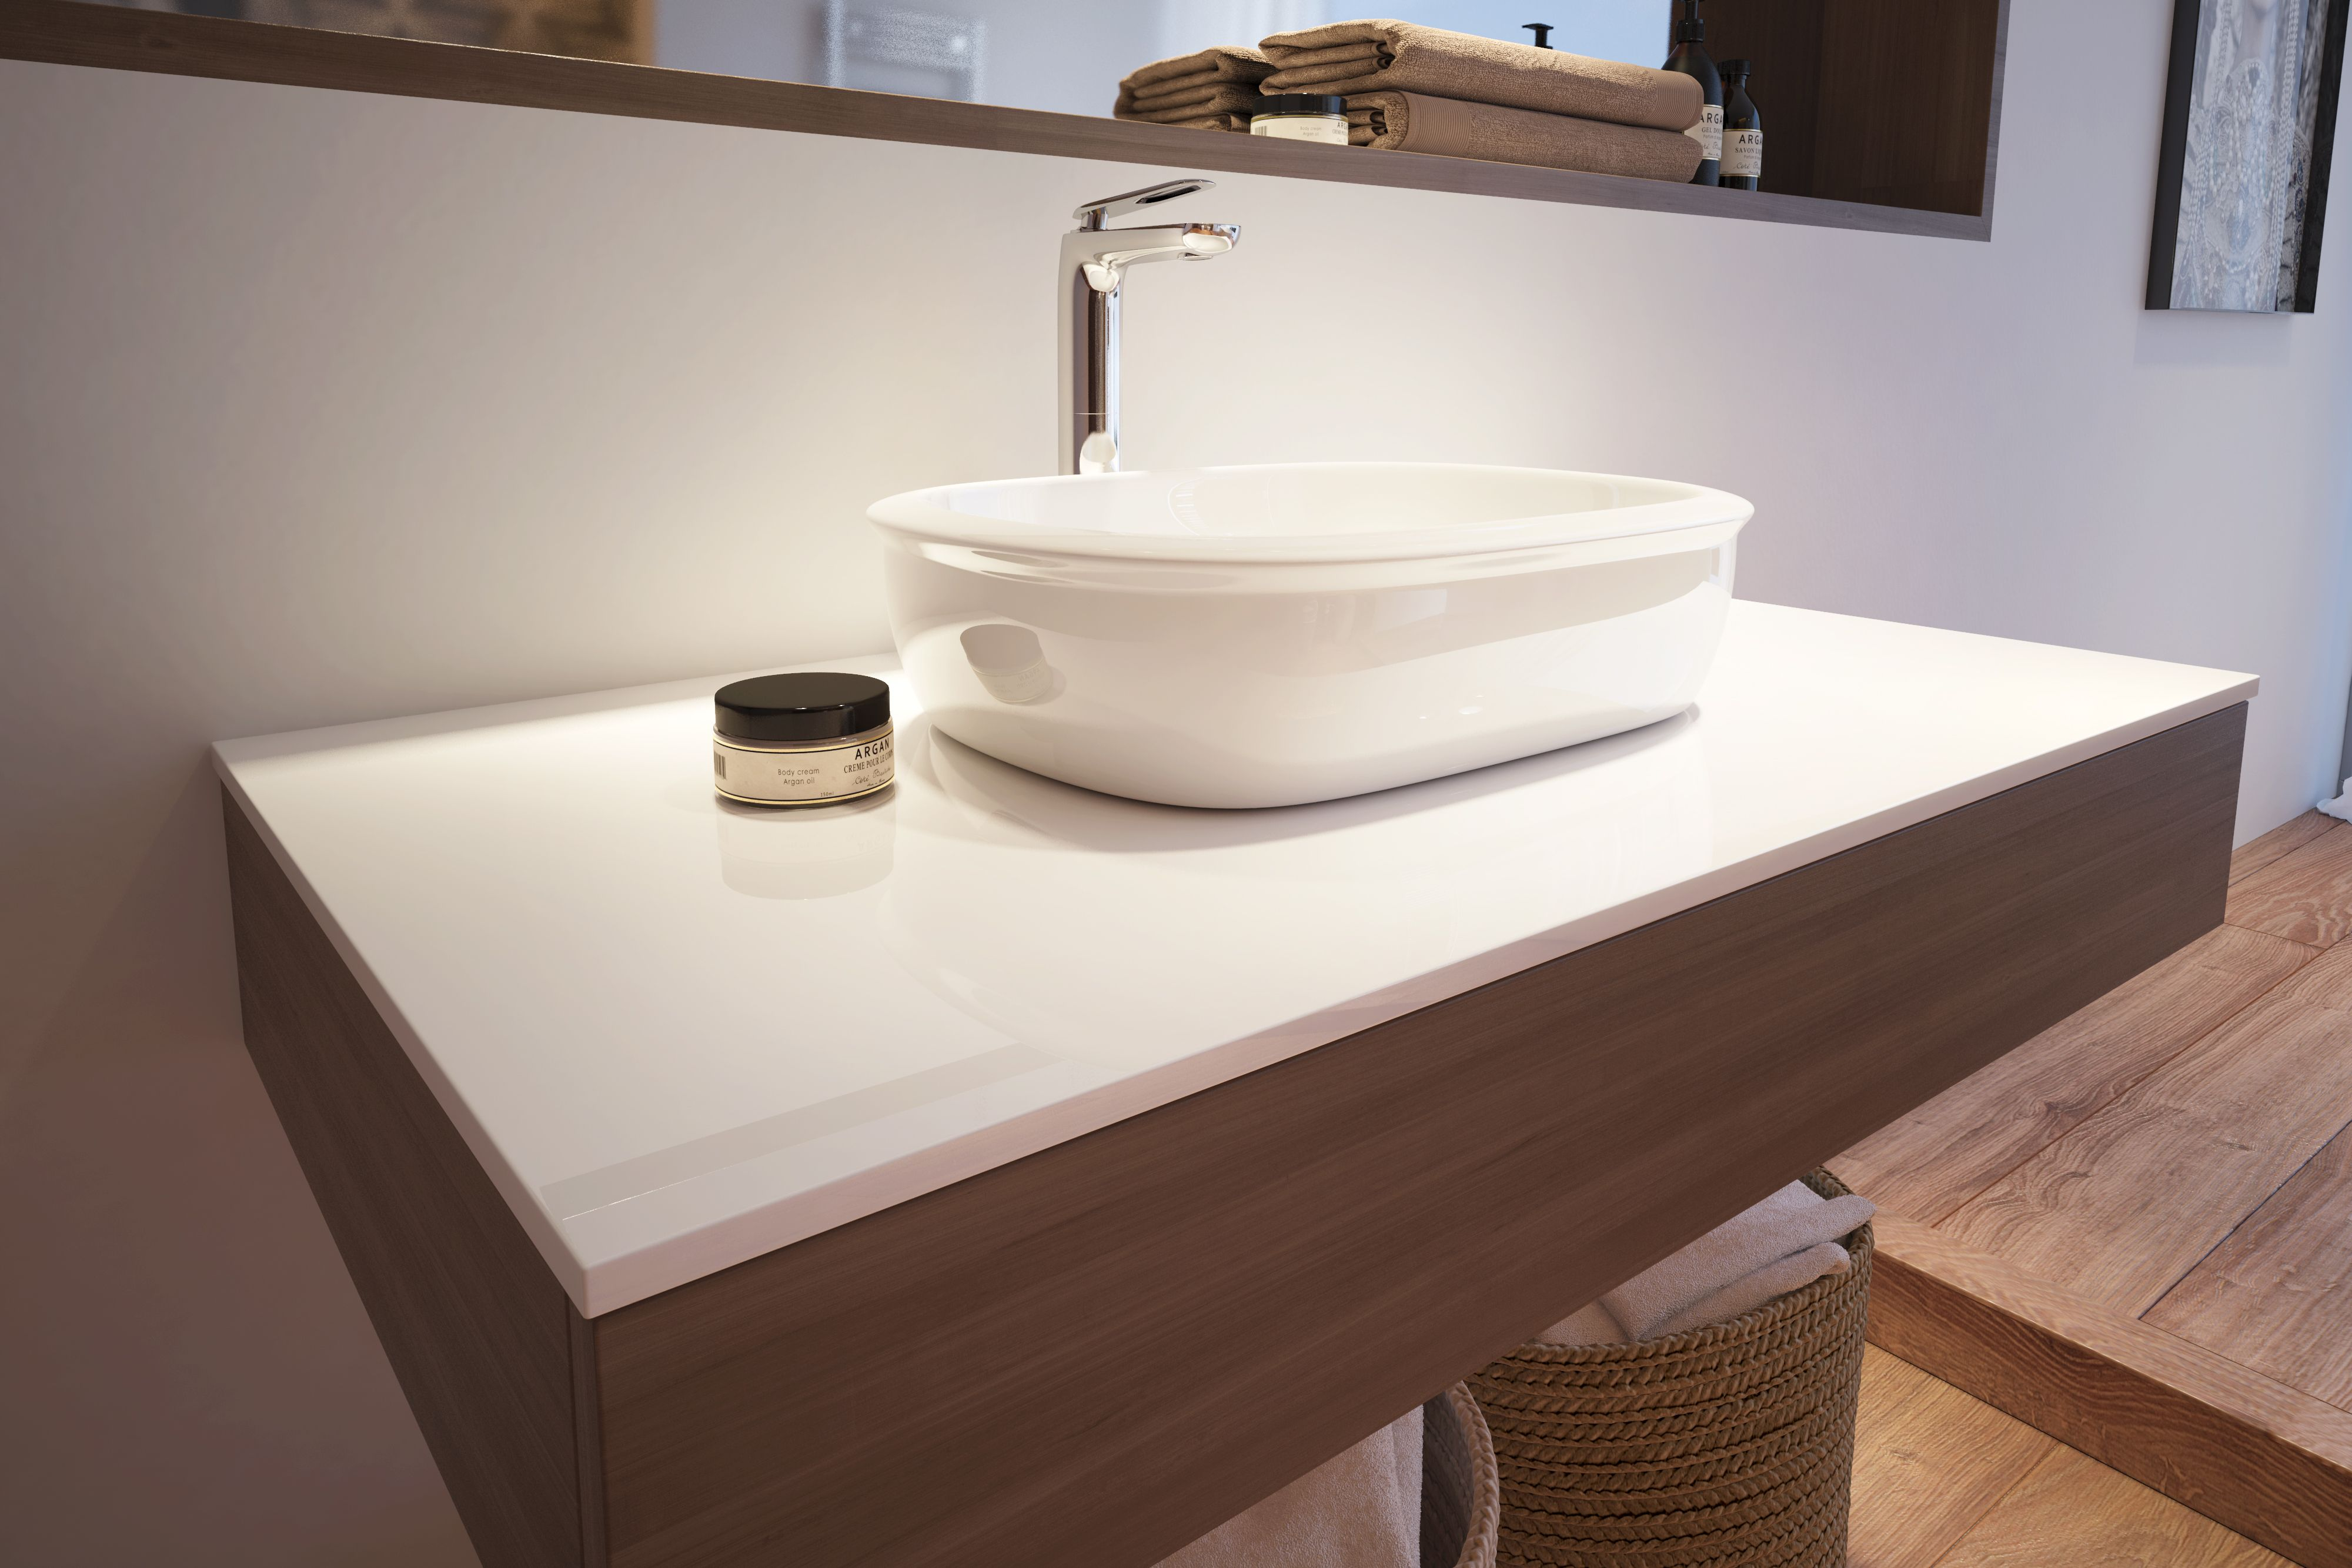 4 Secrets to a luxurious bathroom look